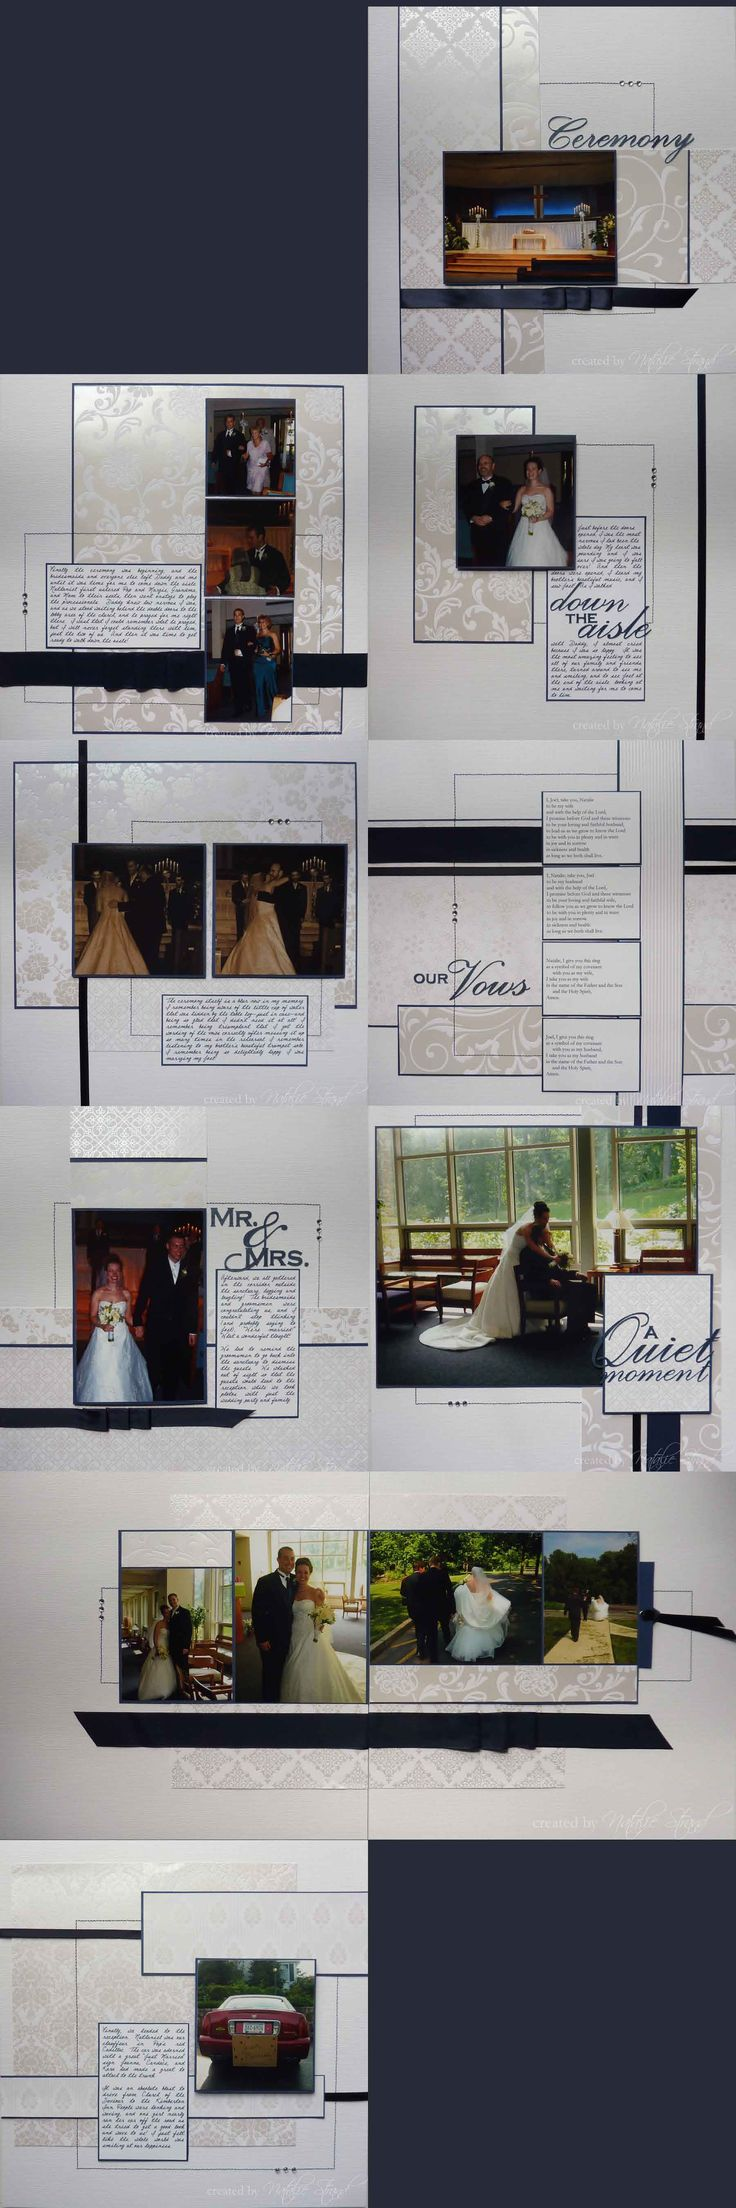 Vietnam scrapbook ideas - Wedding Scrapbook Album Ceremony Reception